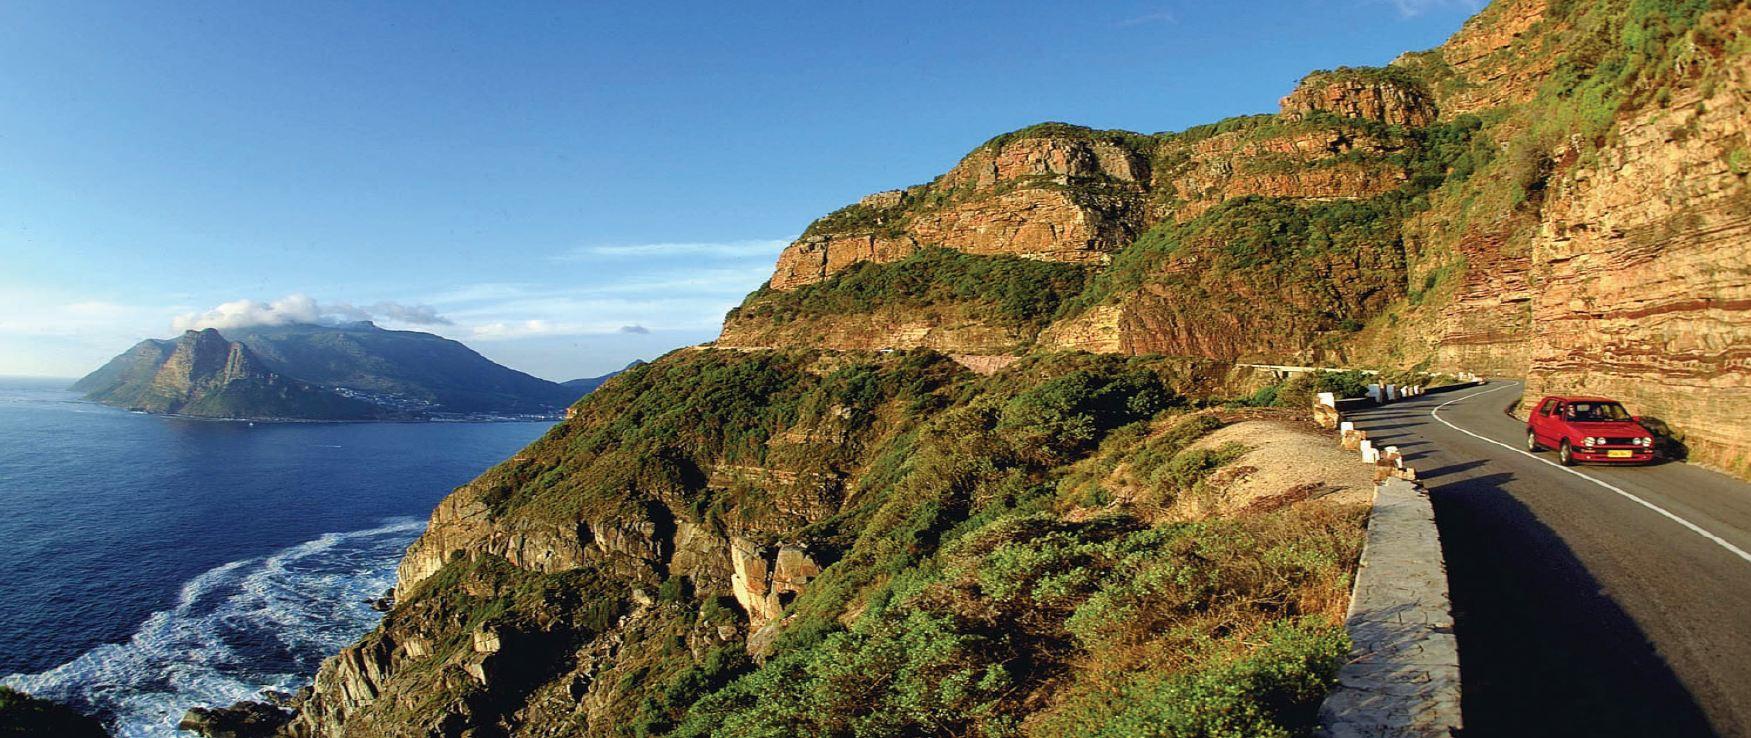 Garden Route Sudafrica immagine